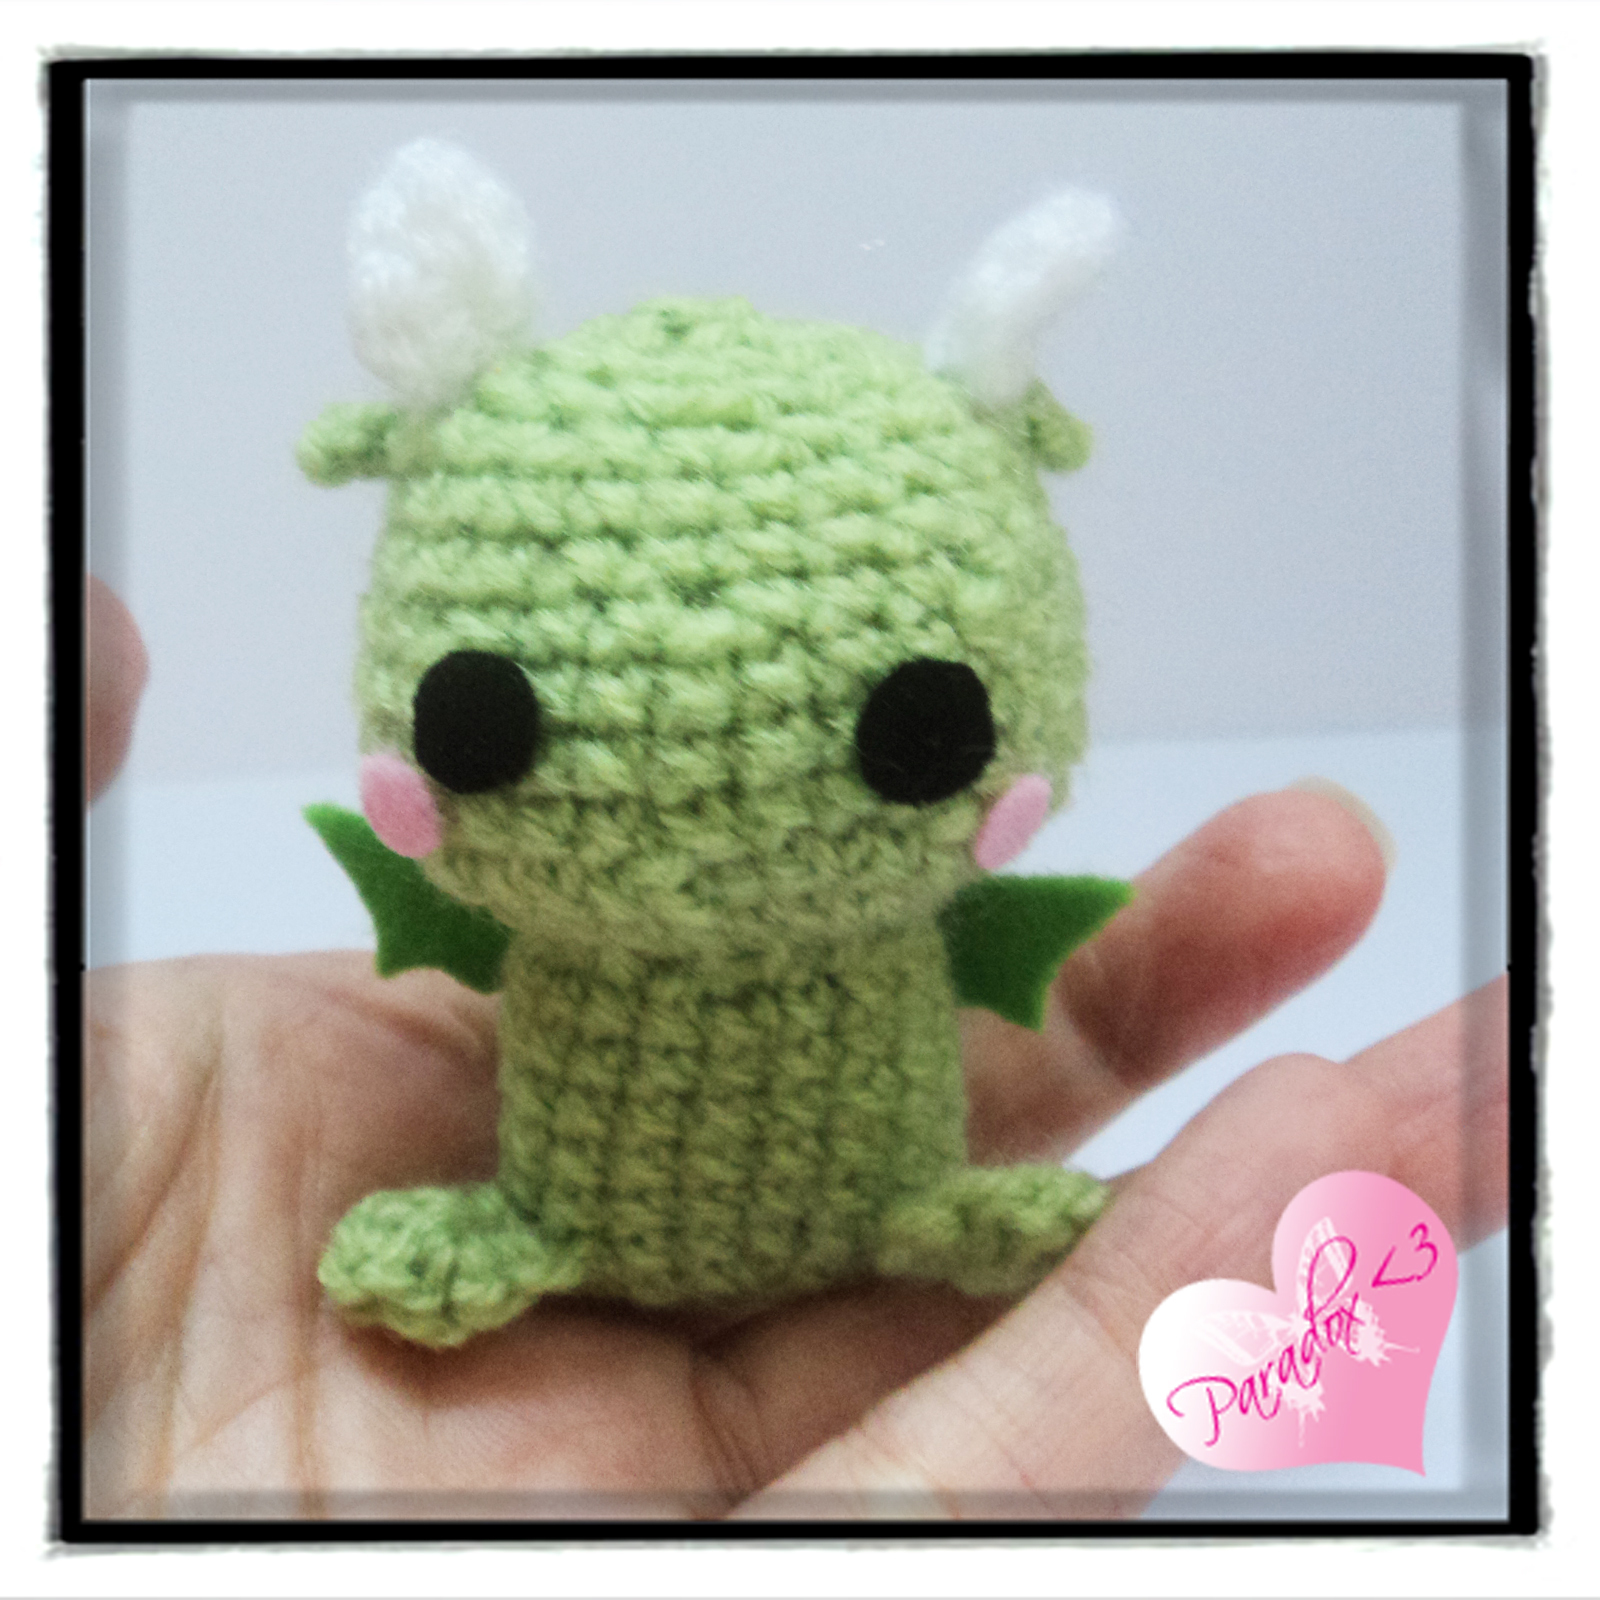 Handmade Crochet Dragon Amigurumi Toy Plush Kawaii Doll ...